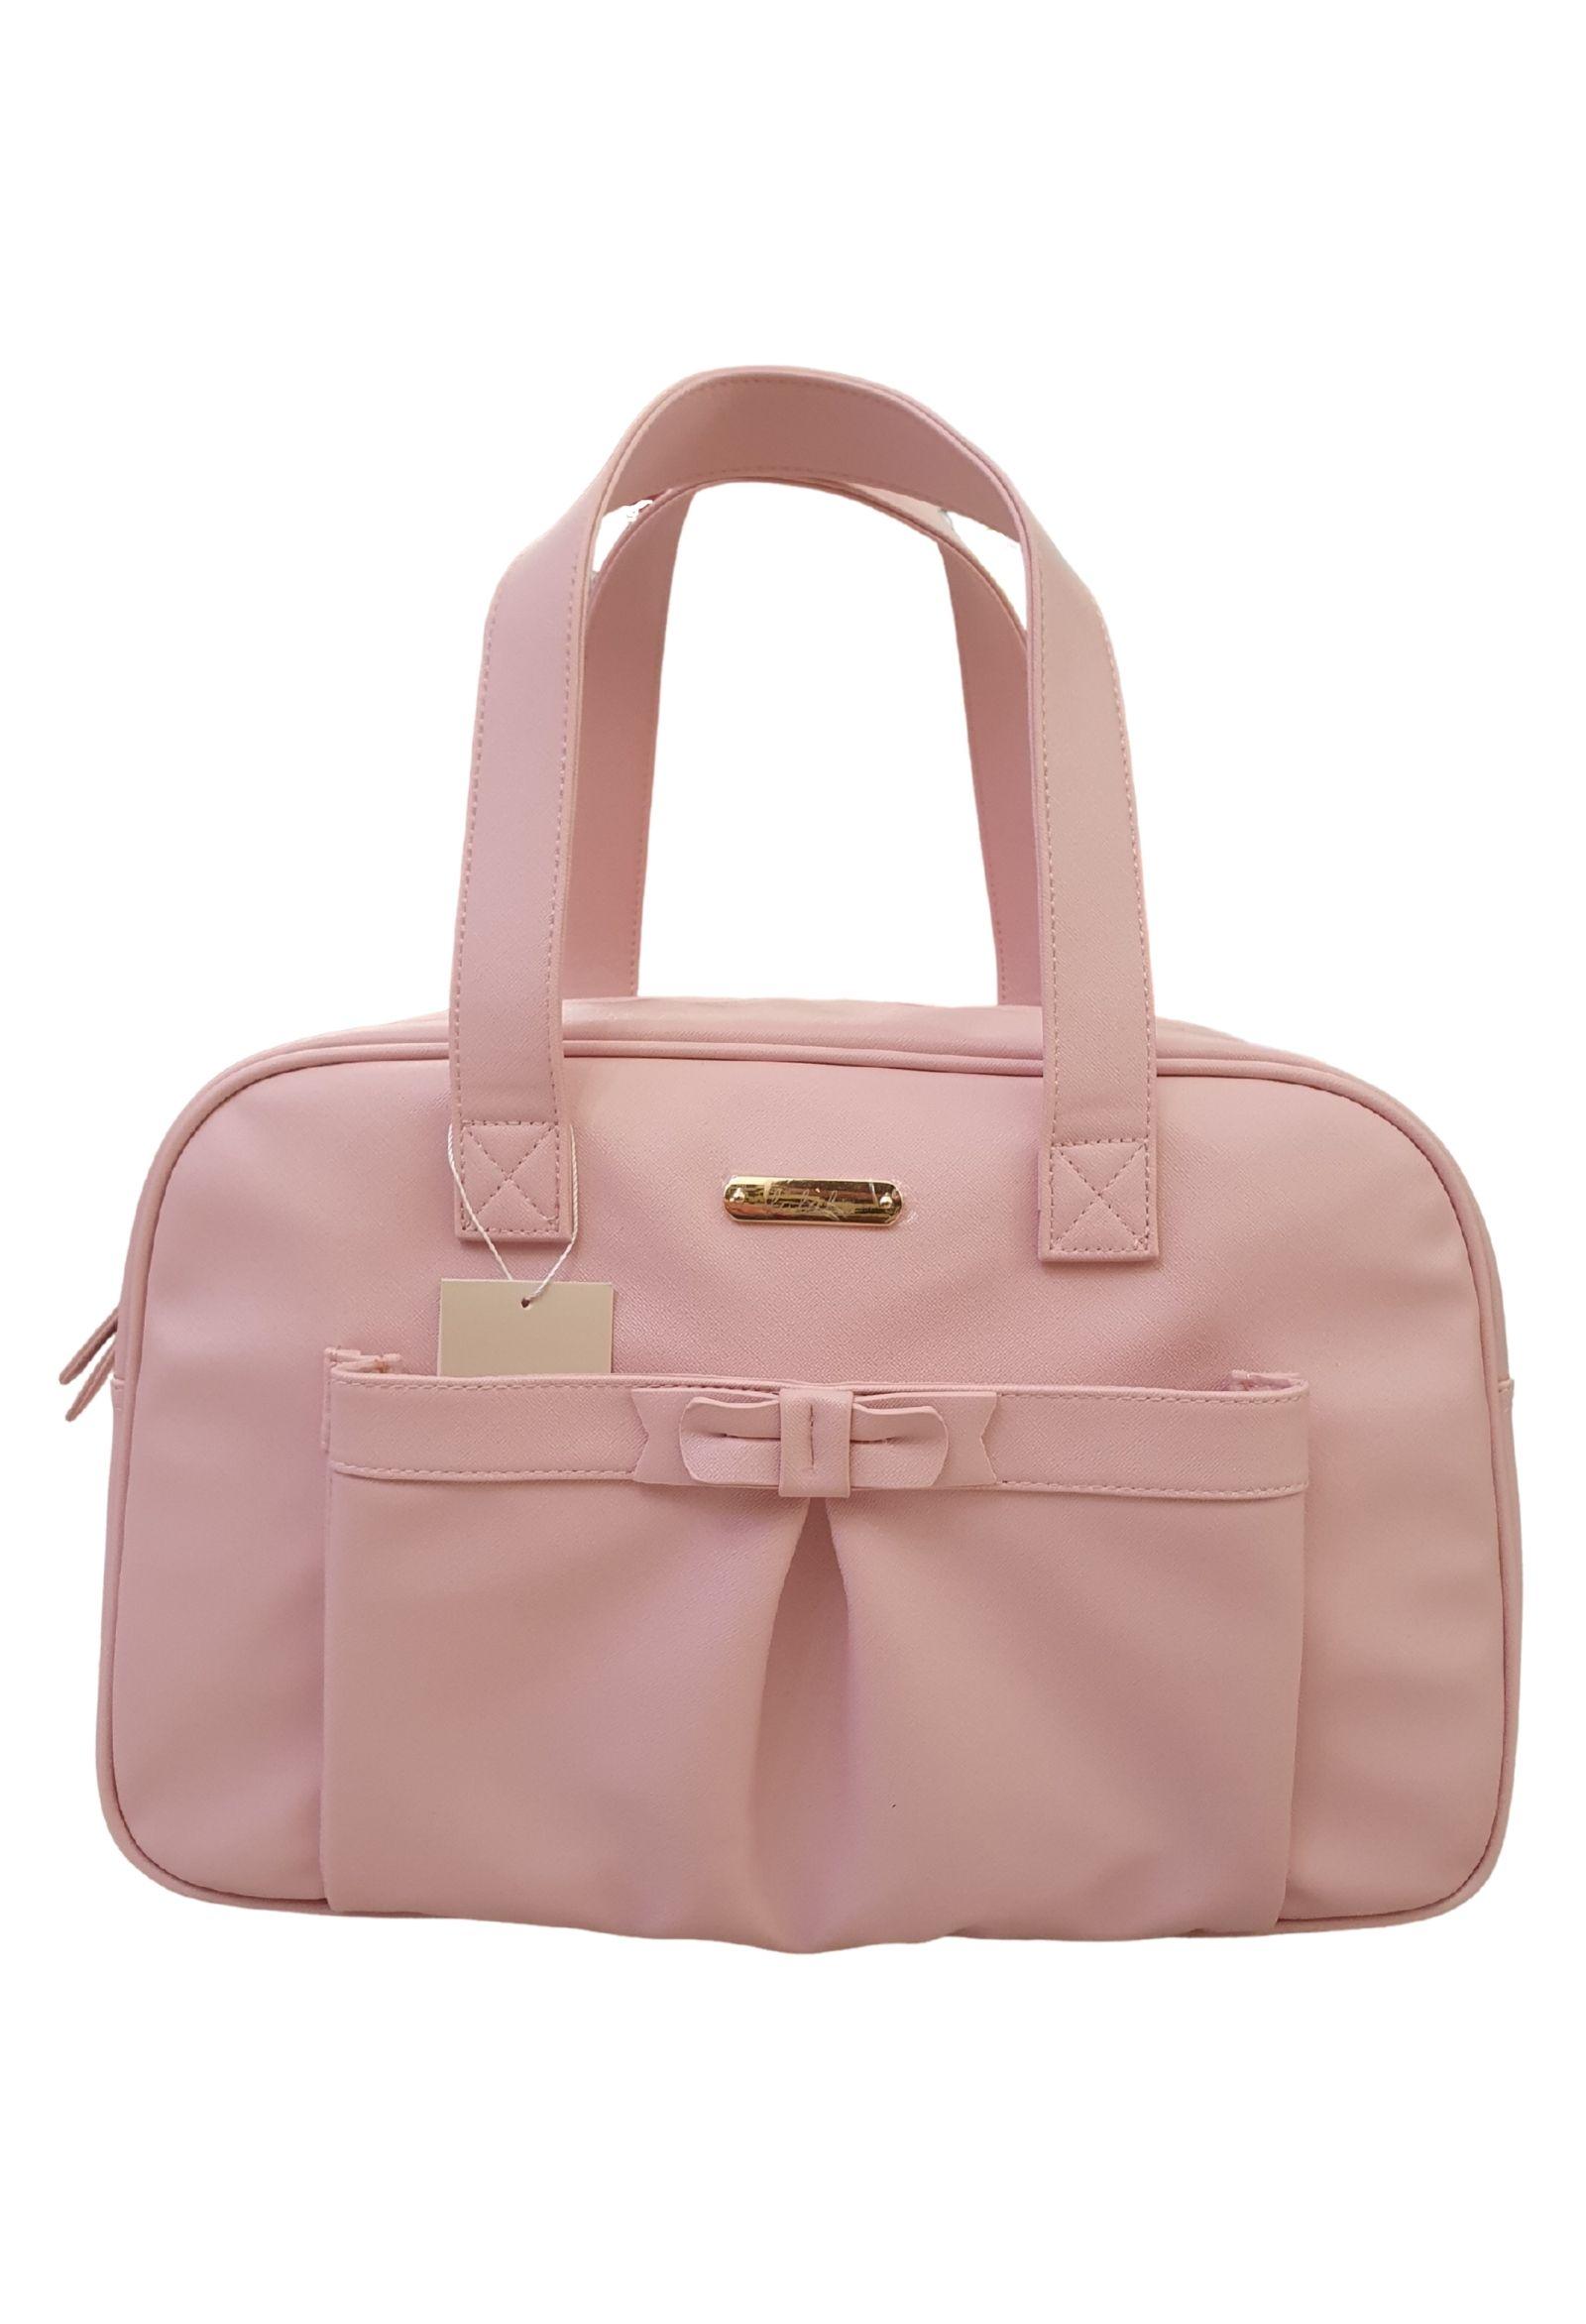 borsa nascita in pelle rosa multitasche e tracolla lalalu   Borse   BNL02UNI